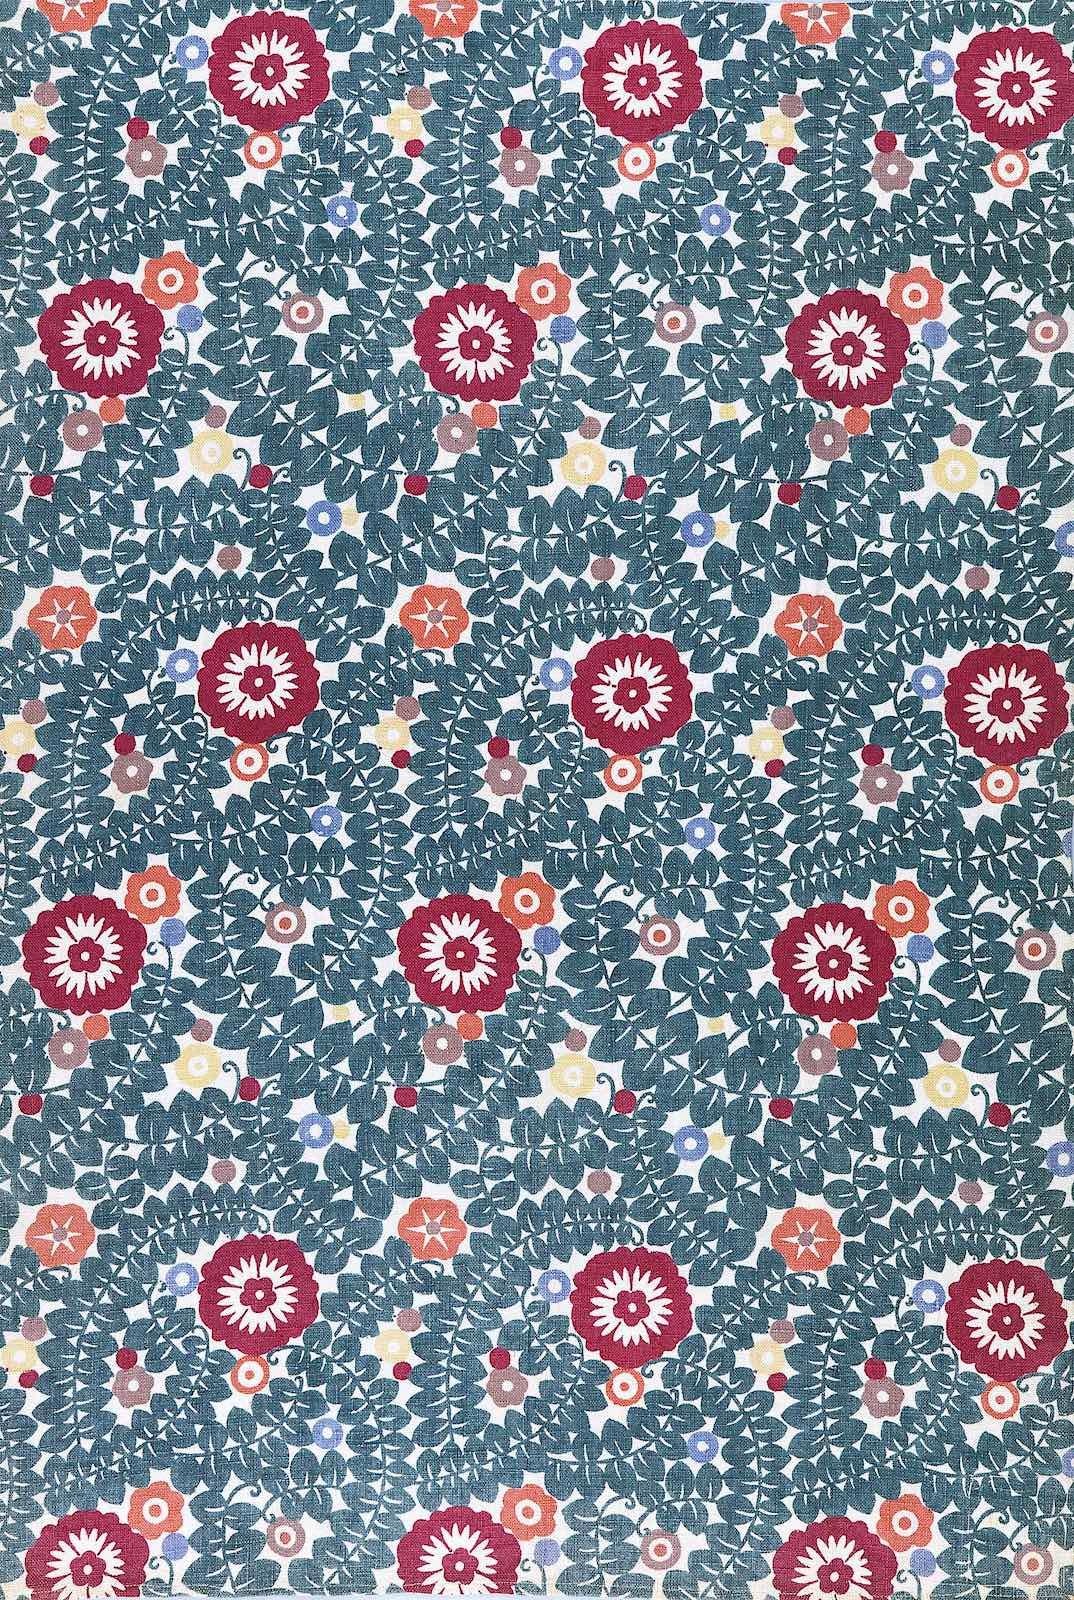 Wiener Werkstätte textile 1911? A pattern of flowers in in wine and teal colors